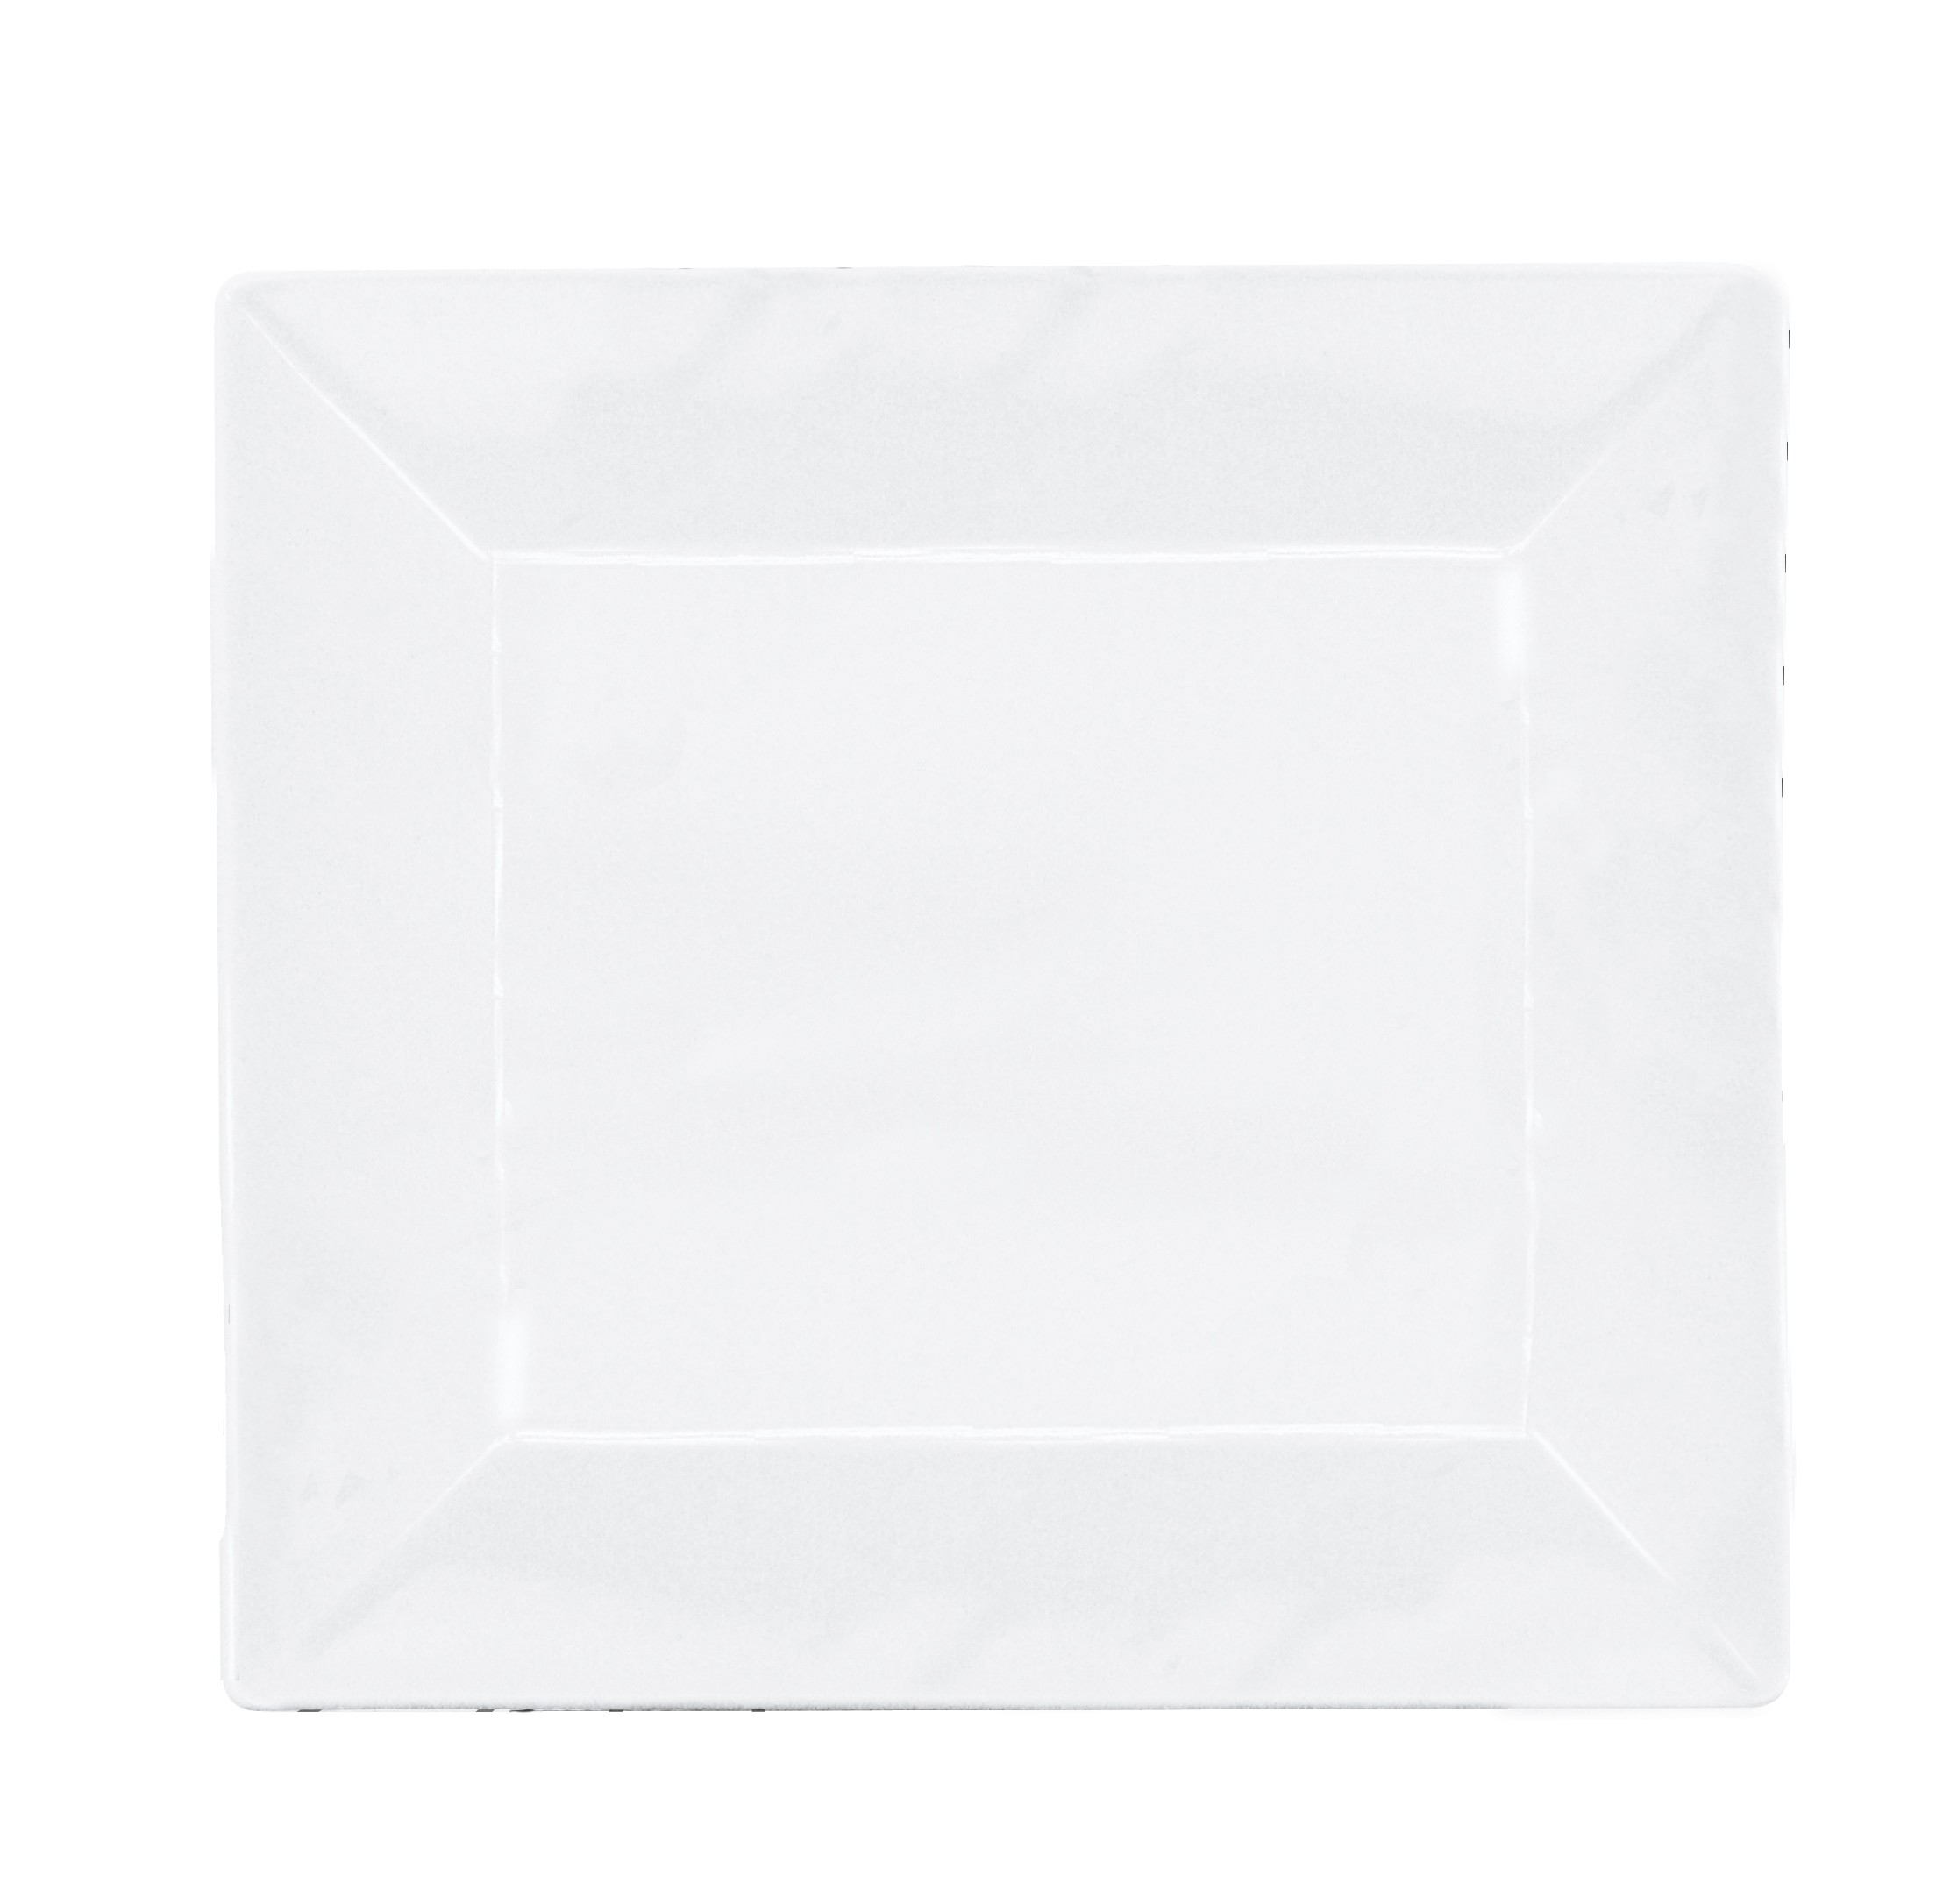 Prato Sobremesa Melamine Branca Quadrado 20cm - YAZI